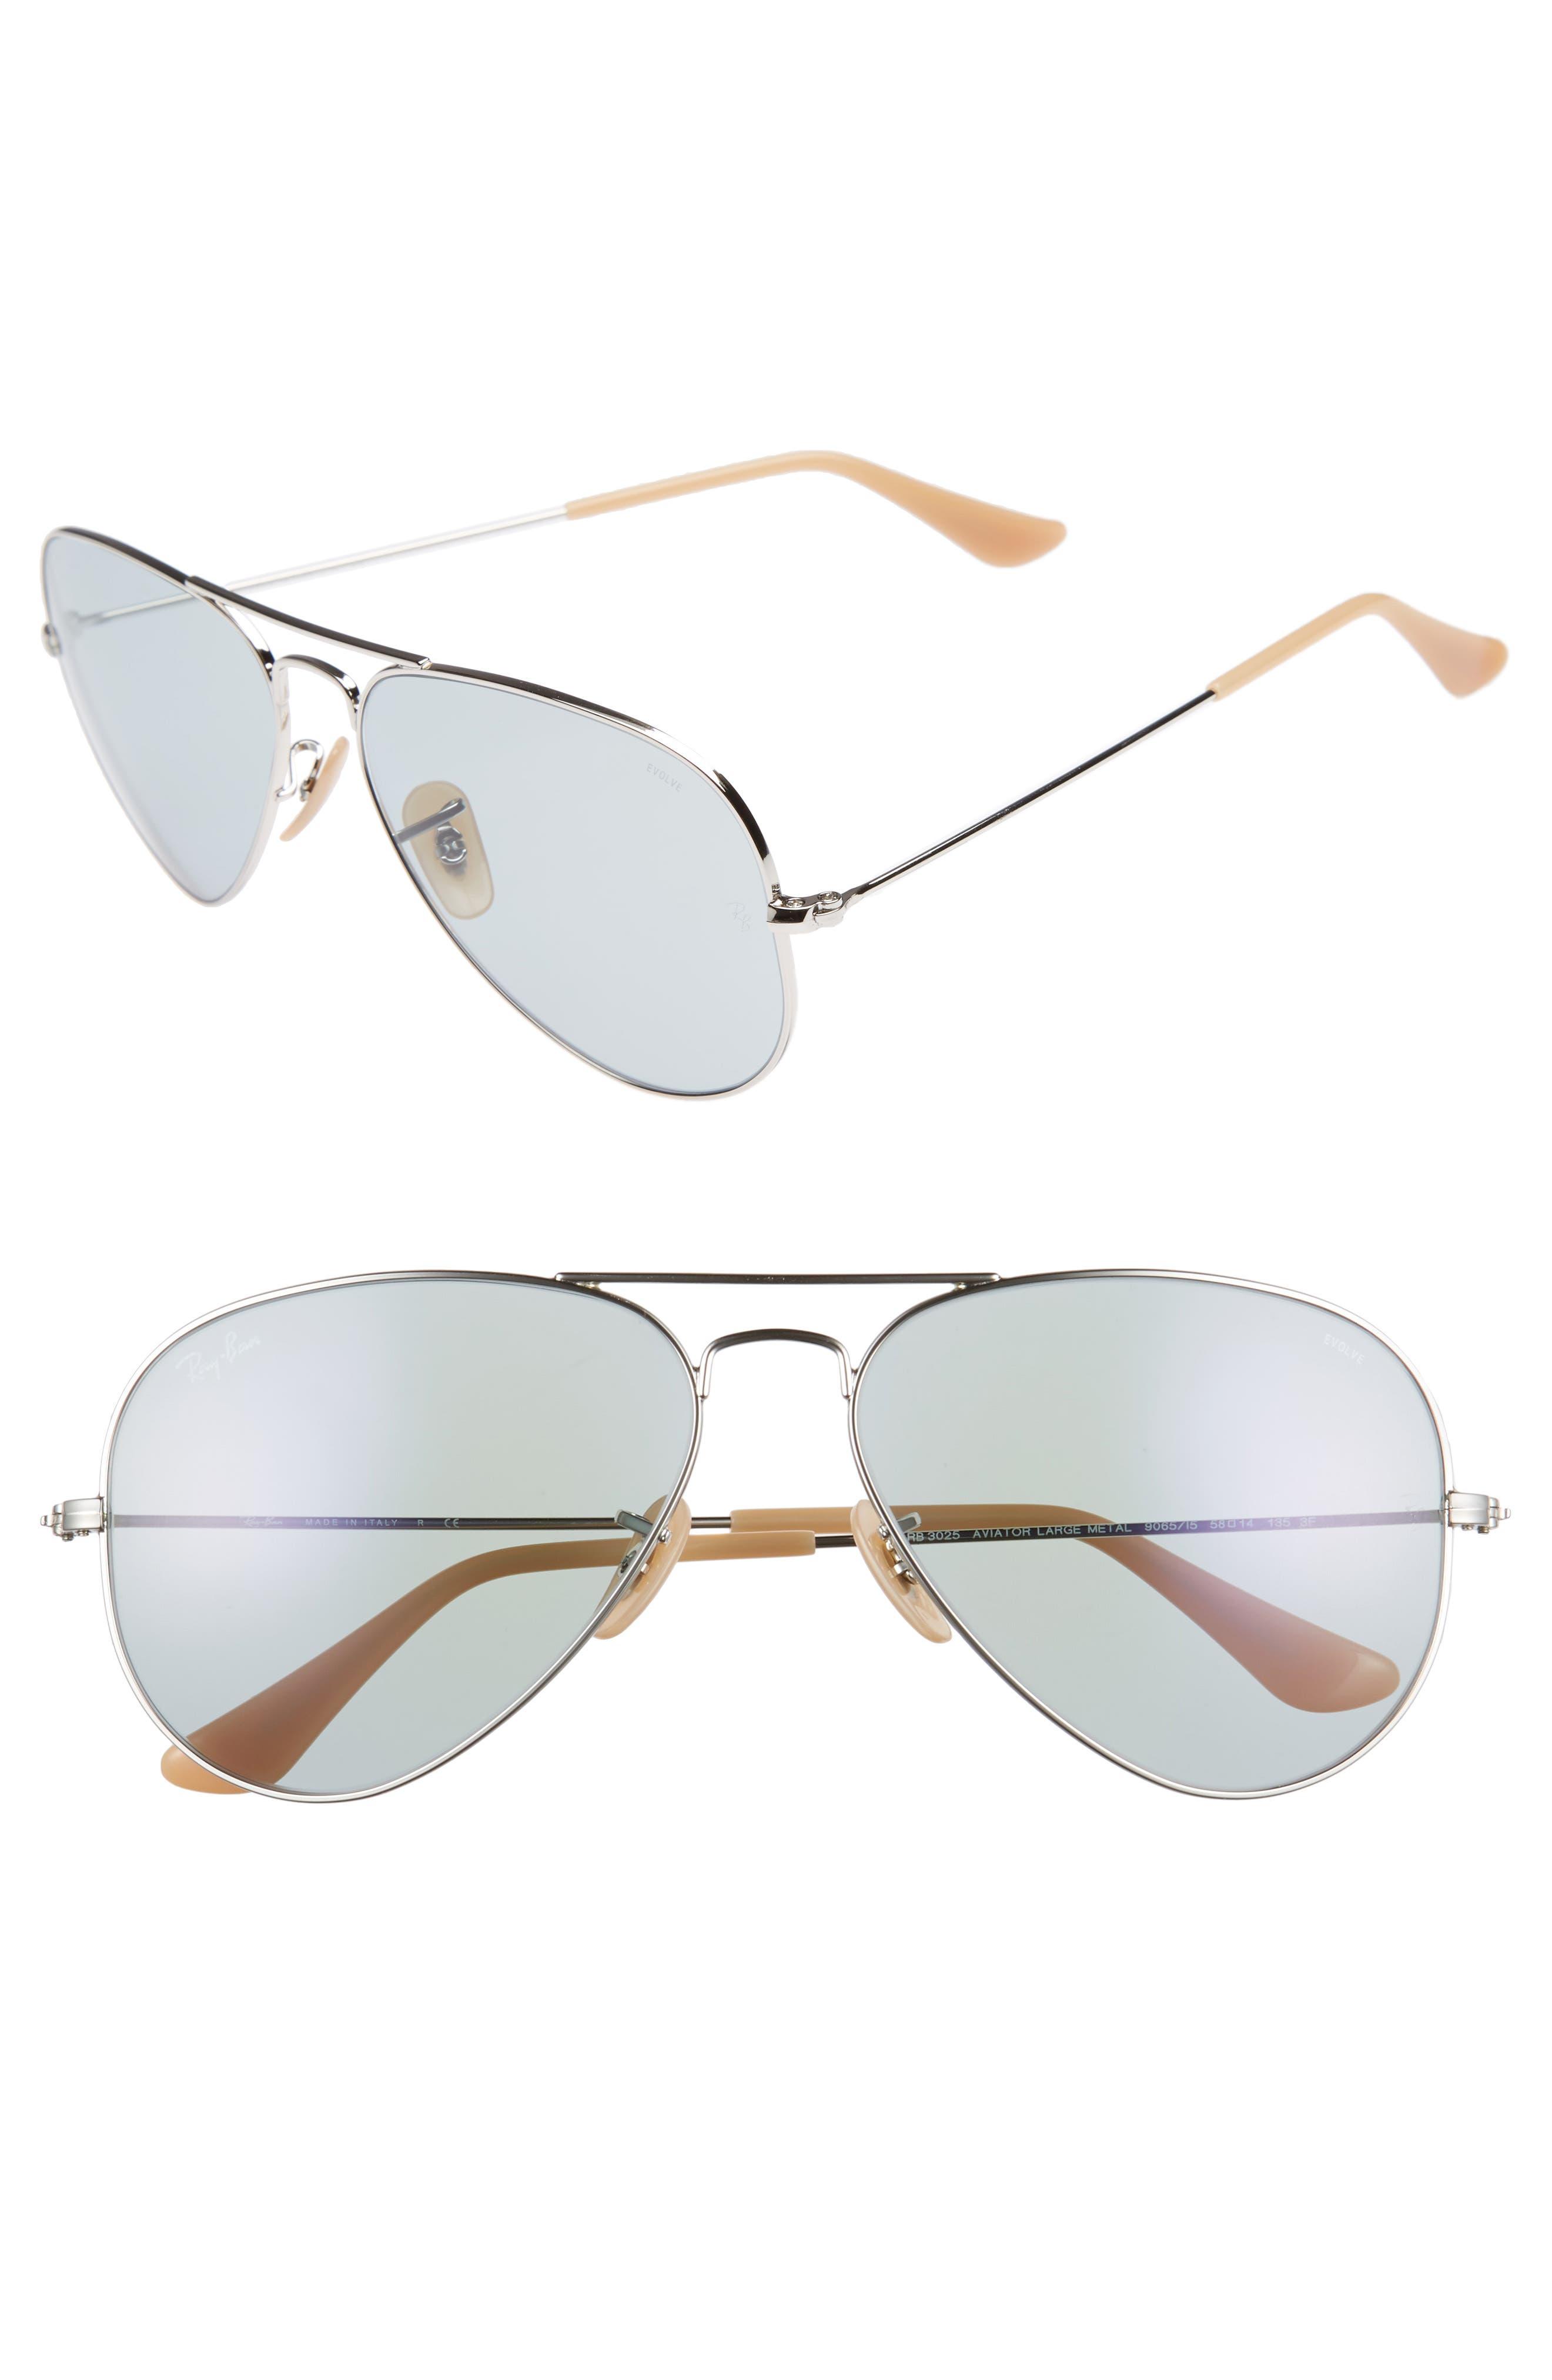 58mm Photochromic Aviator Sunglasses,                         Main,                         color, Silver Blue